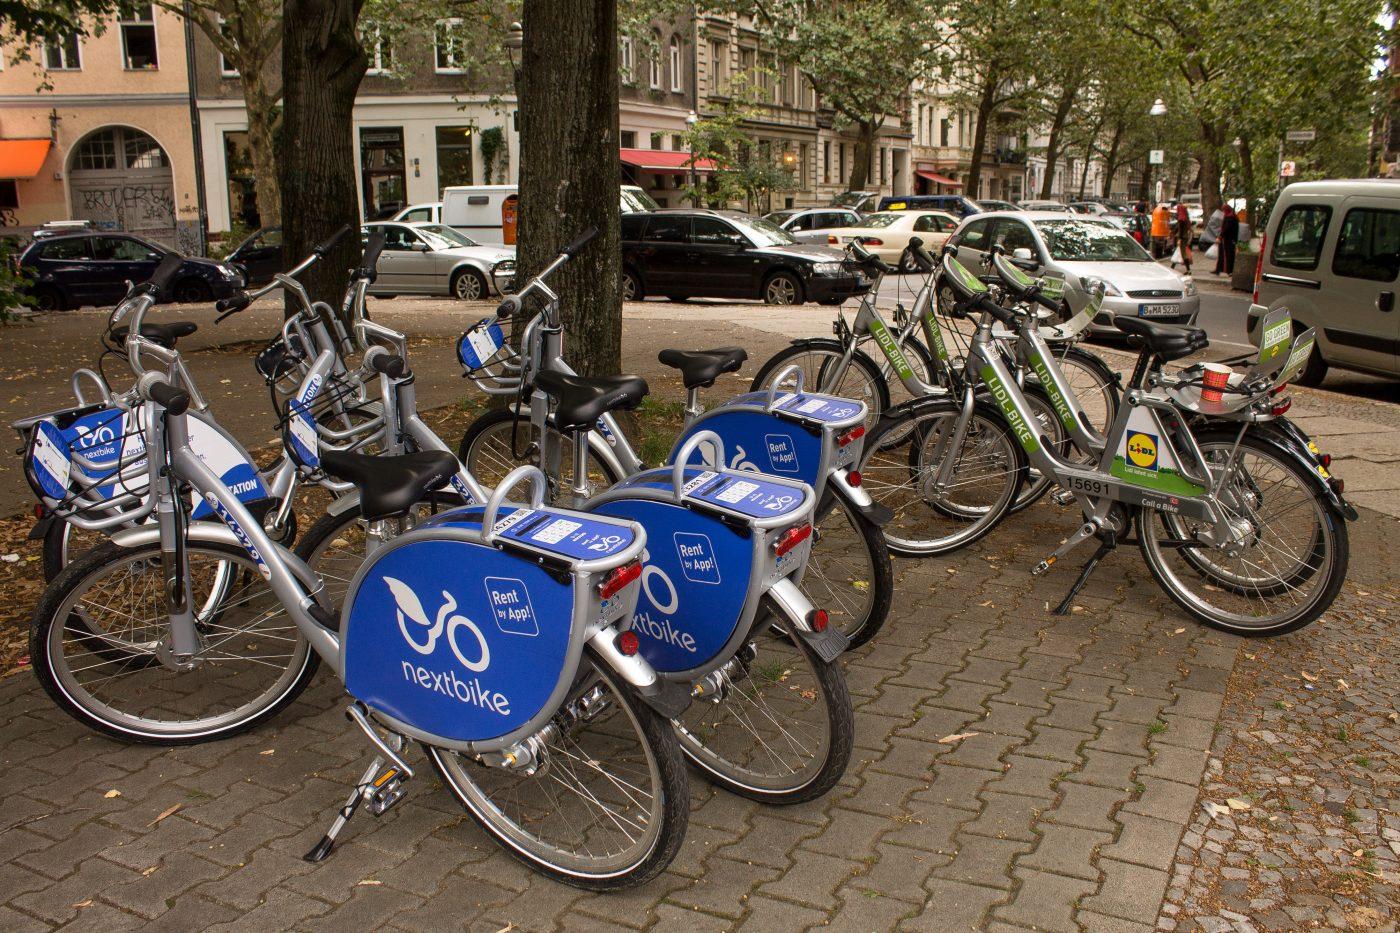 Berlin bike sharing . Berlin, Germany Contributed by Sam from Alternative Travelers